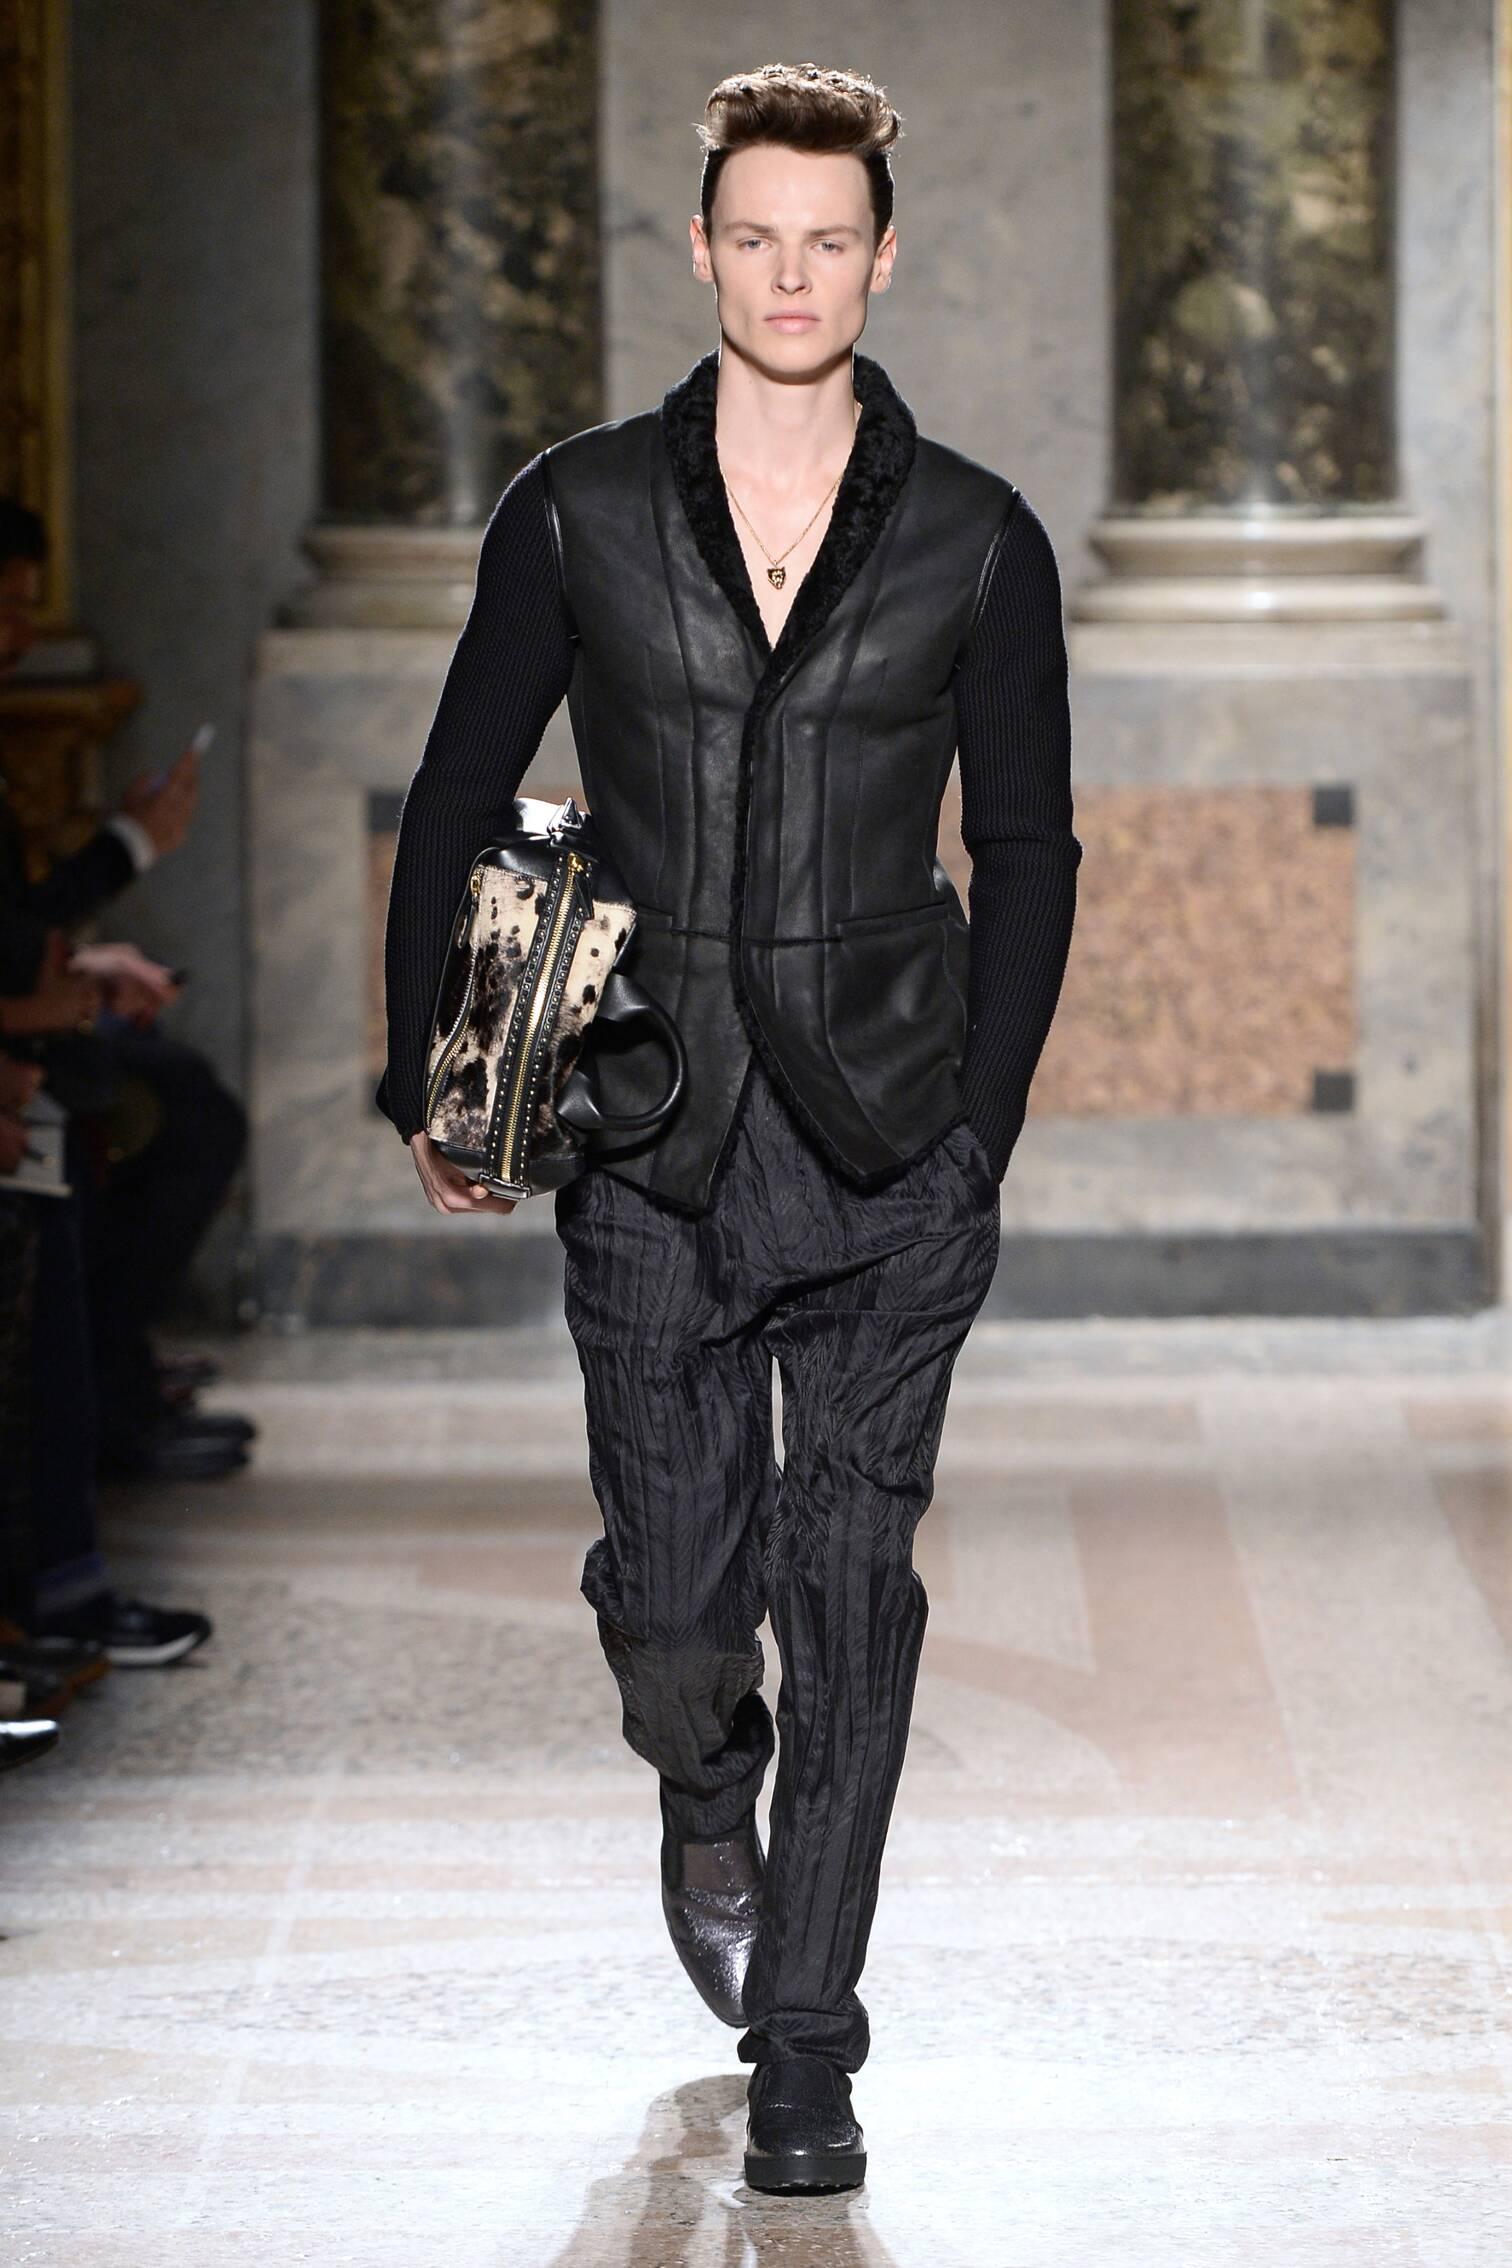 Roberto Cavalli Collection Fall 2015 Catwalk